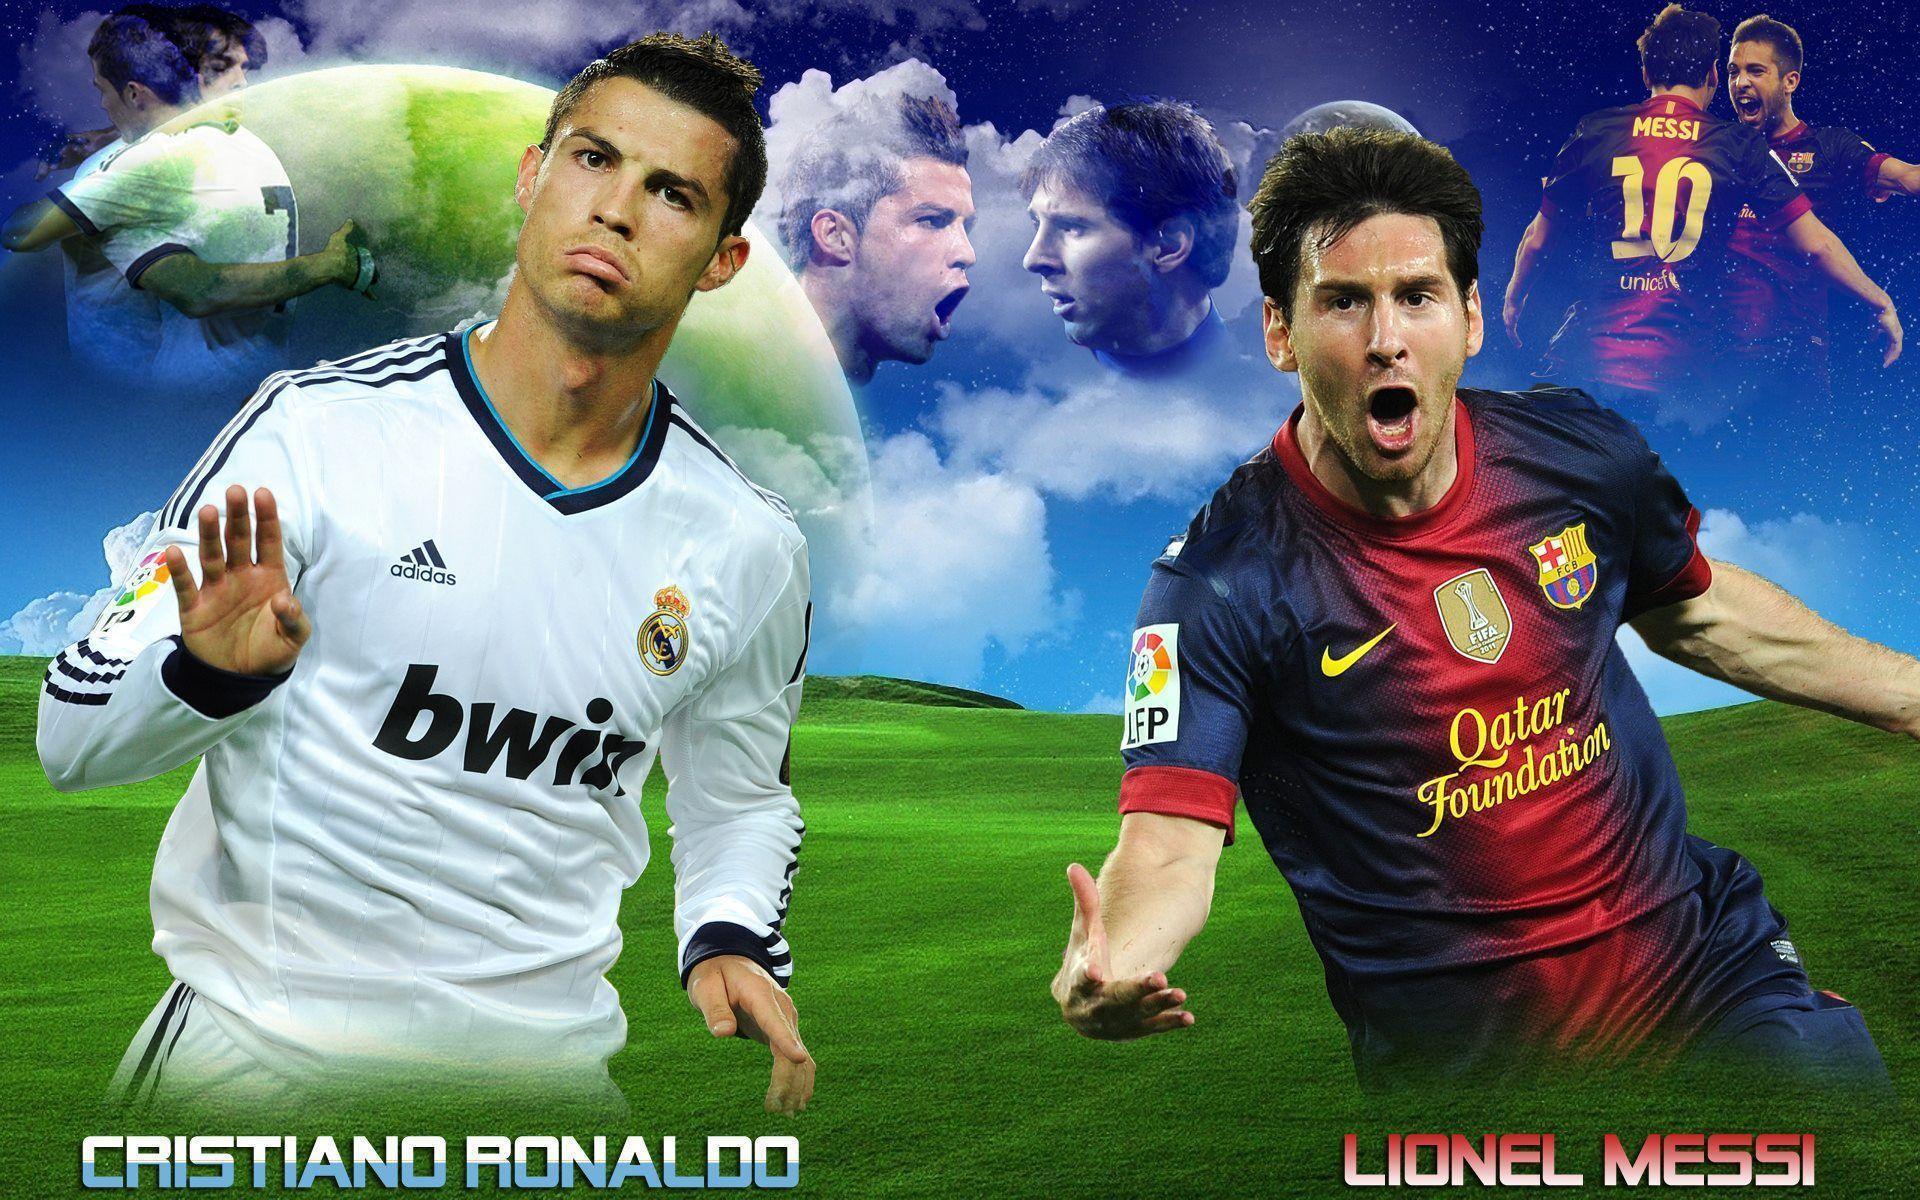 Messi Vs Ronaldo Wallpapers Top Free Messi Vs Ronaldo